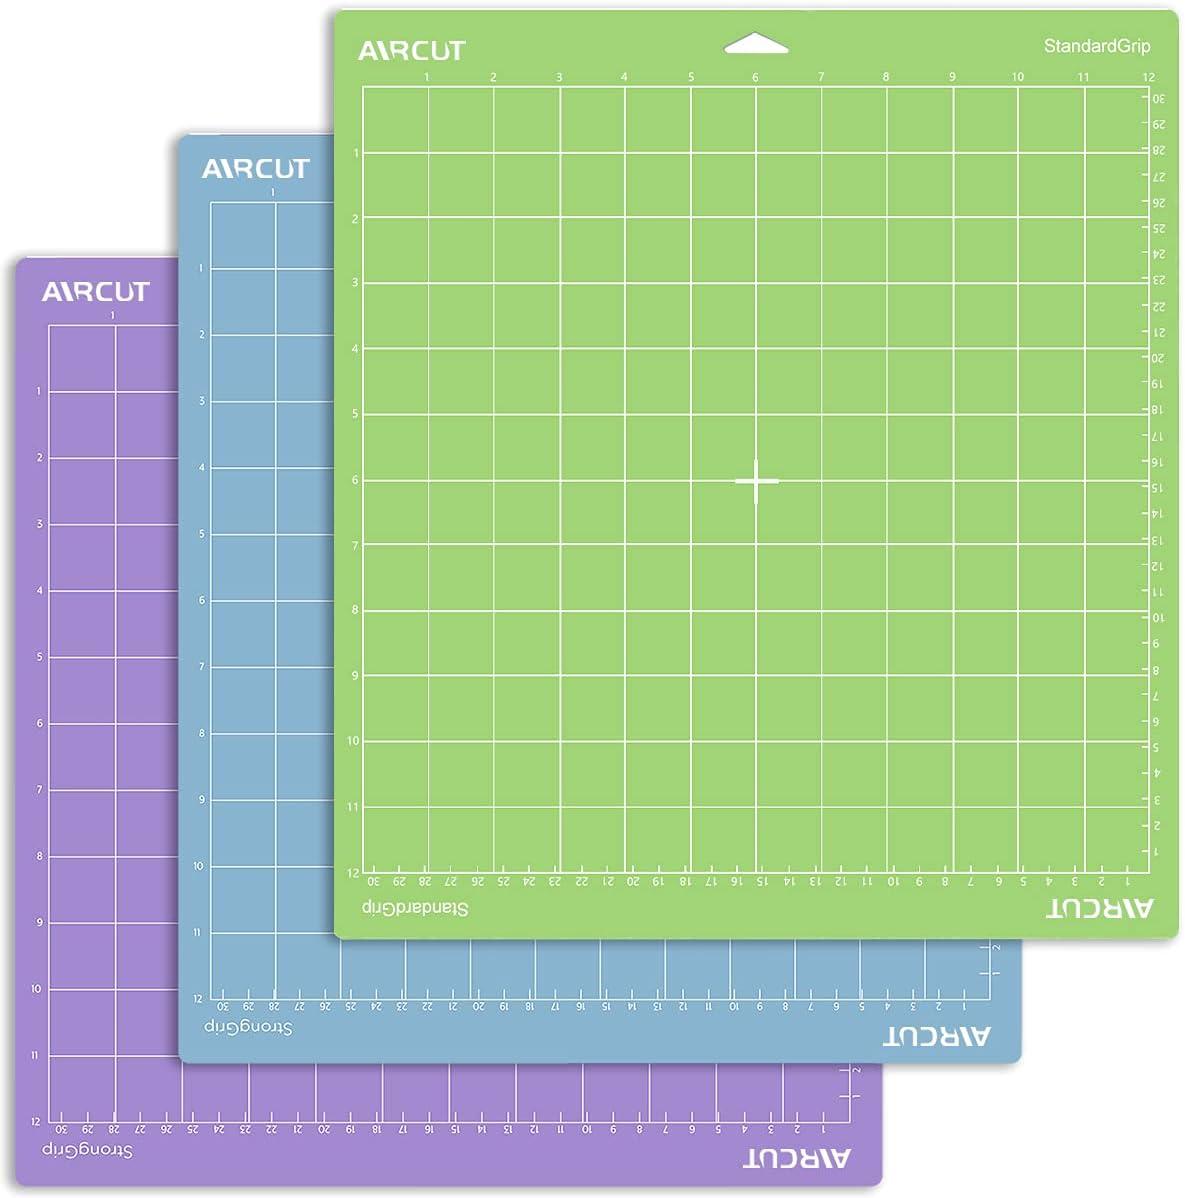 AIRCUT Cutting Mat for Cricut Maker Max 65% OFF 2 Air Explore One security 12x12